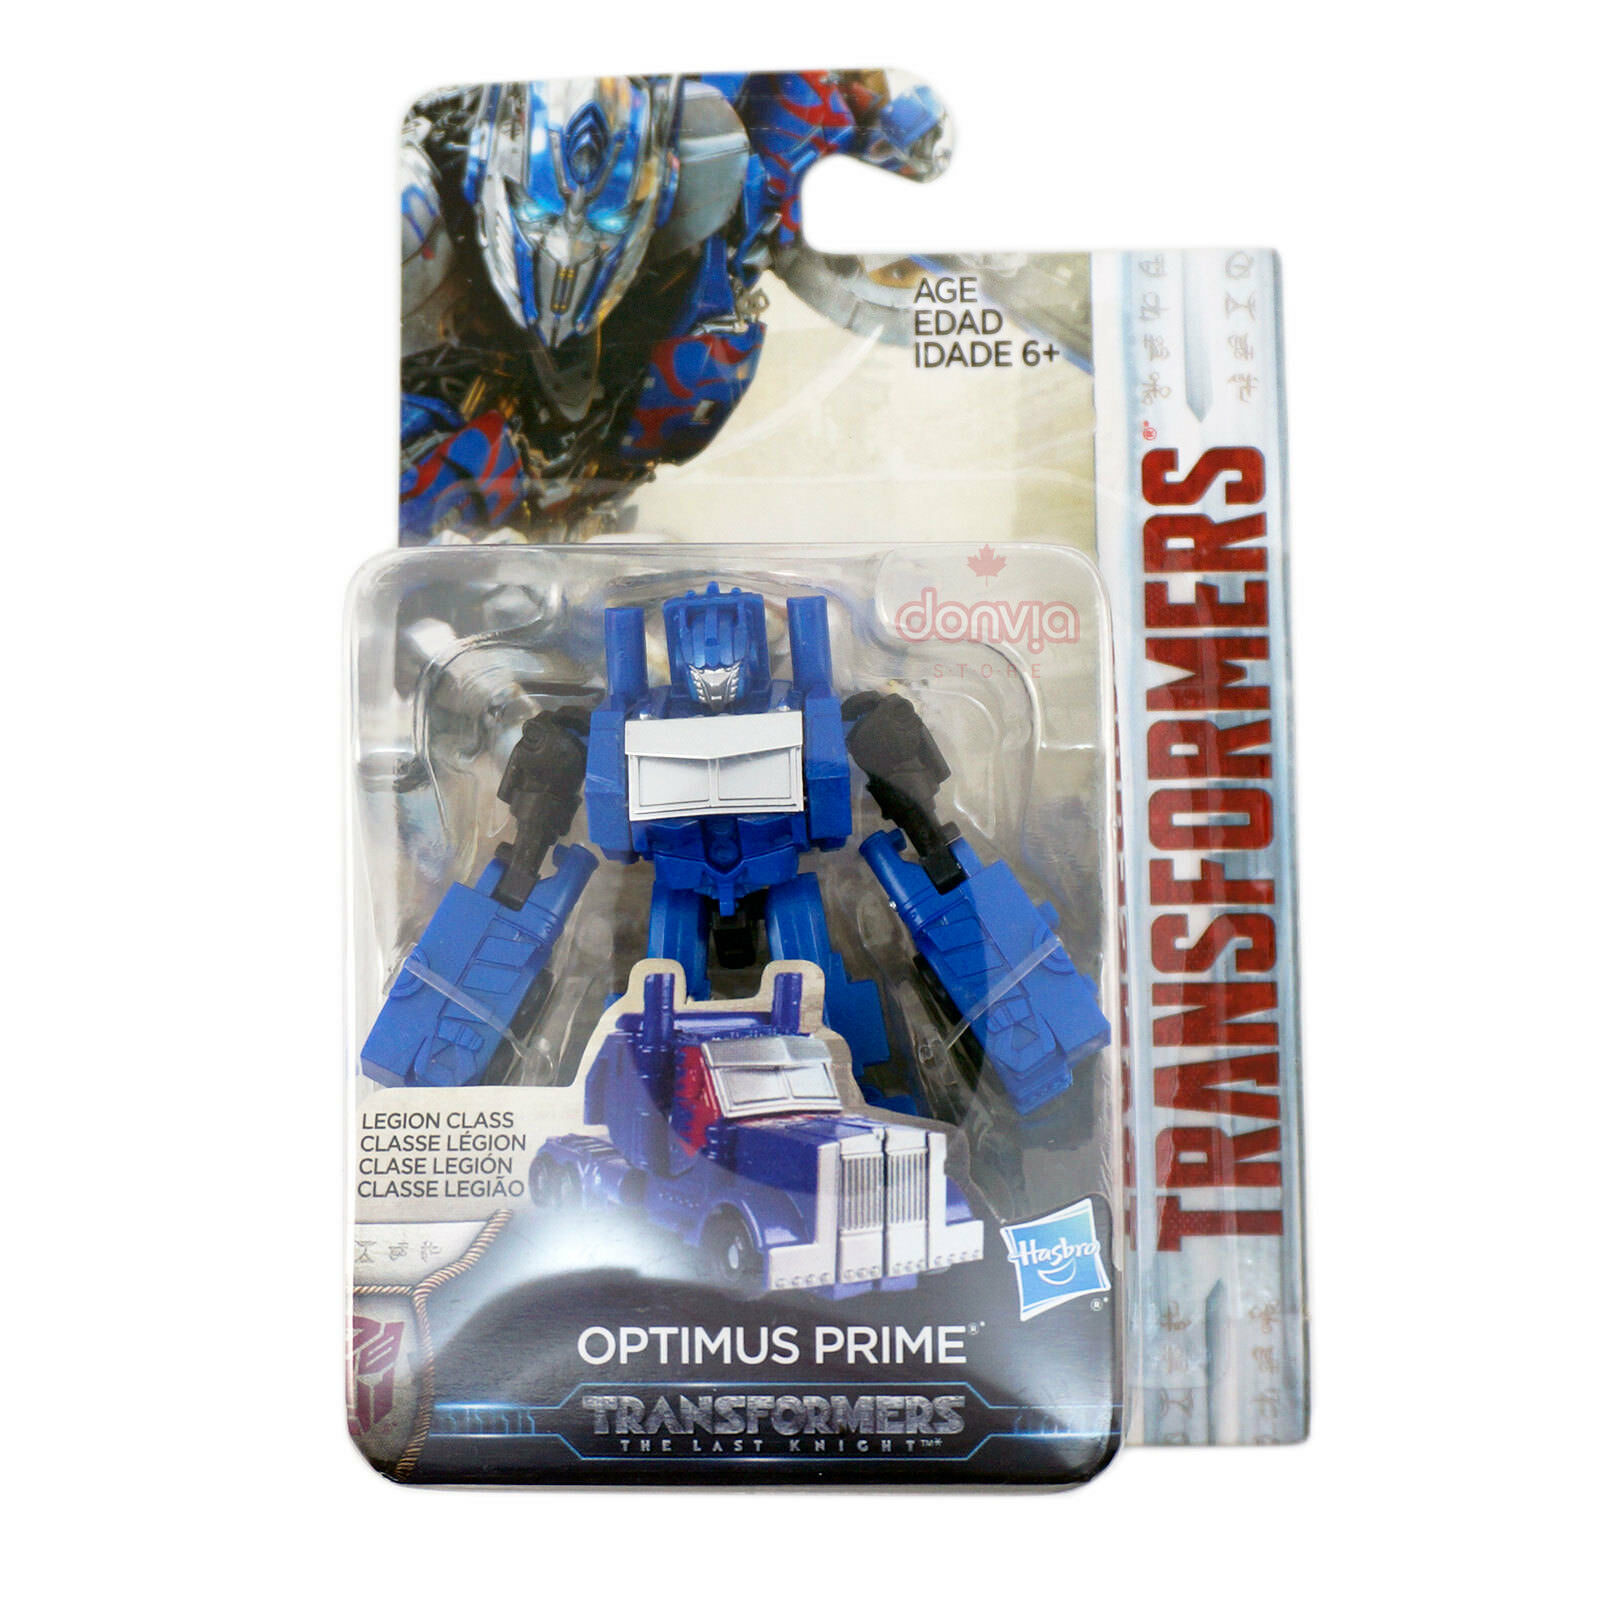 Transformers The Last Knight Legion Class Optimus Prime 3